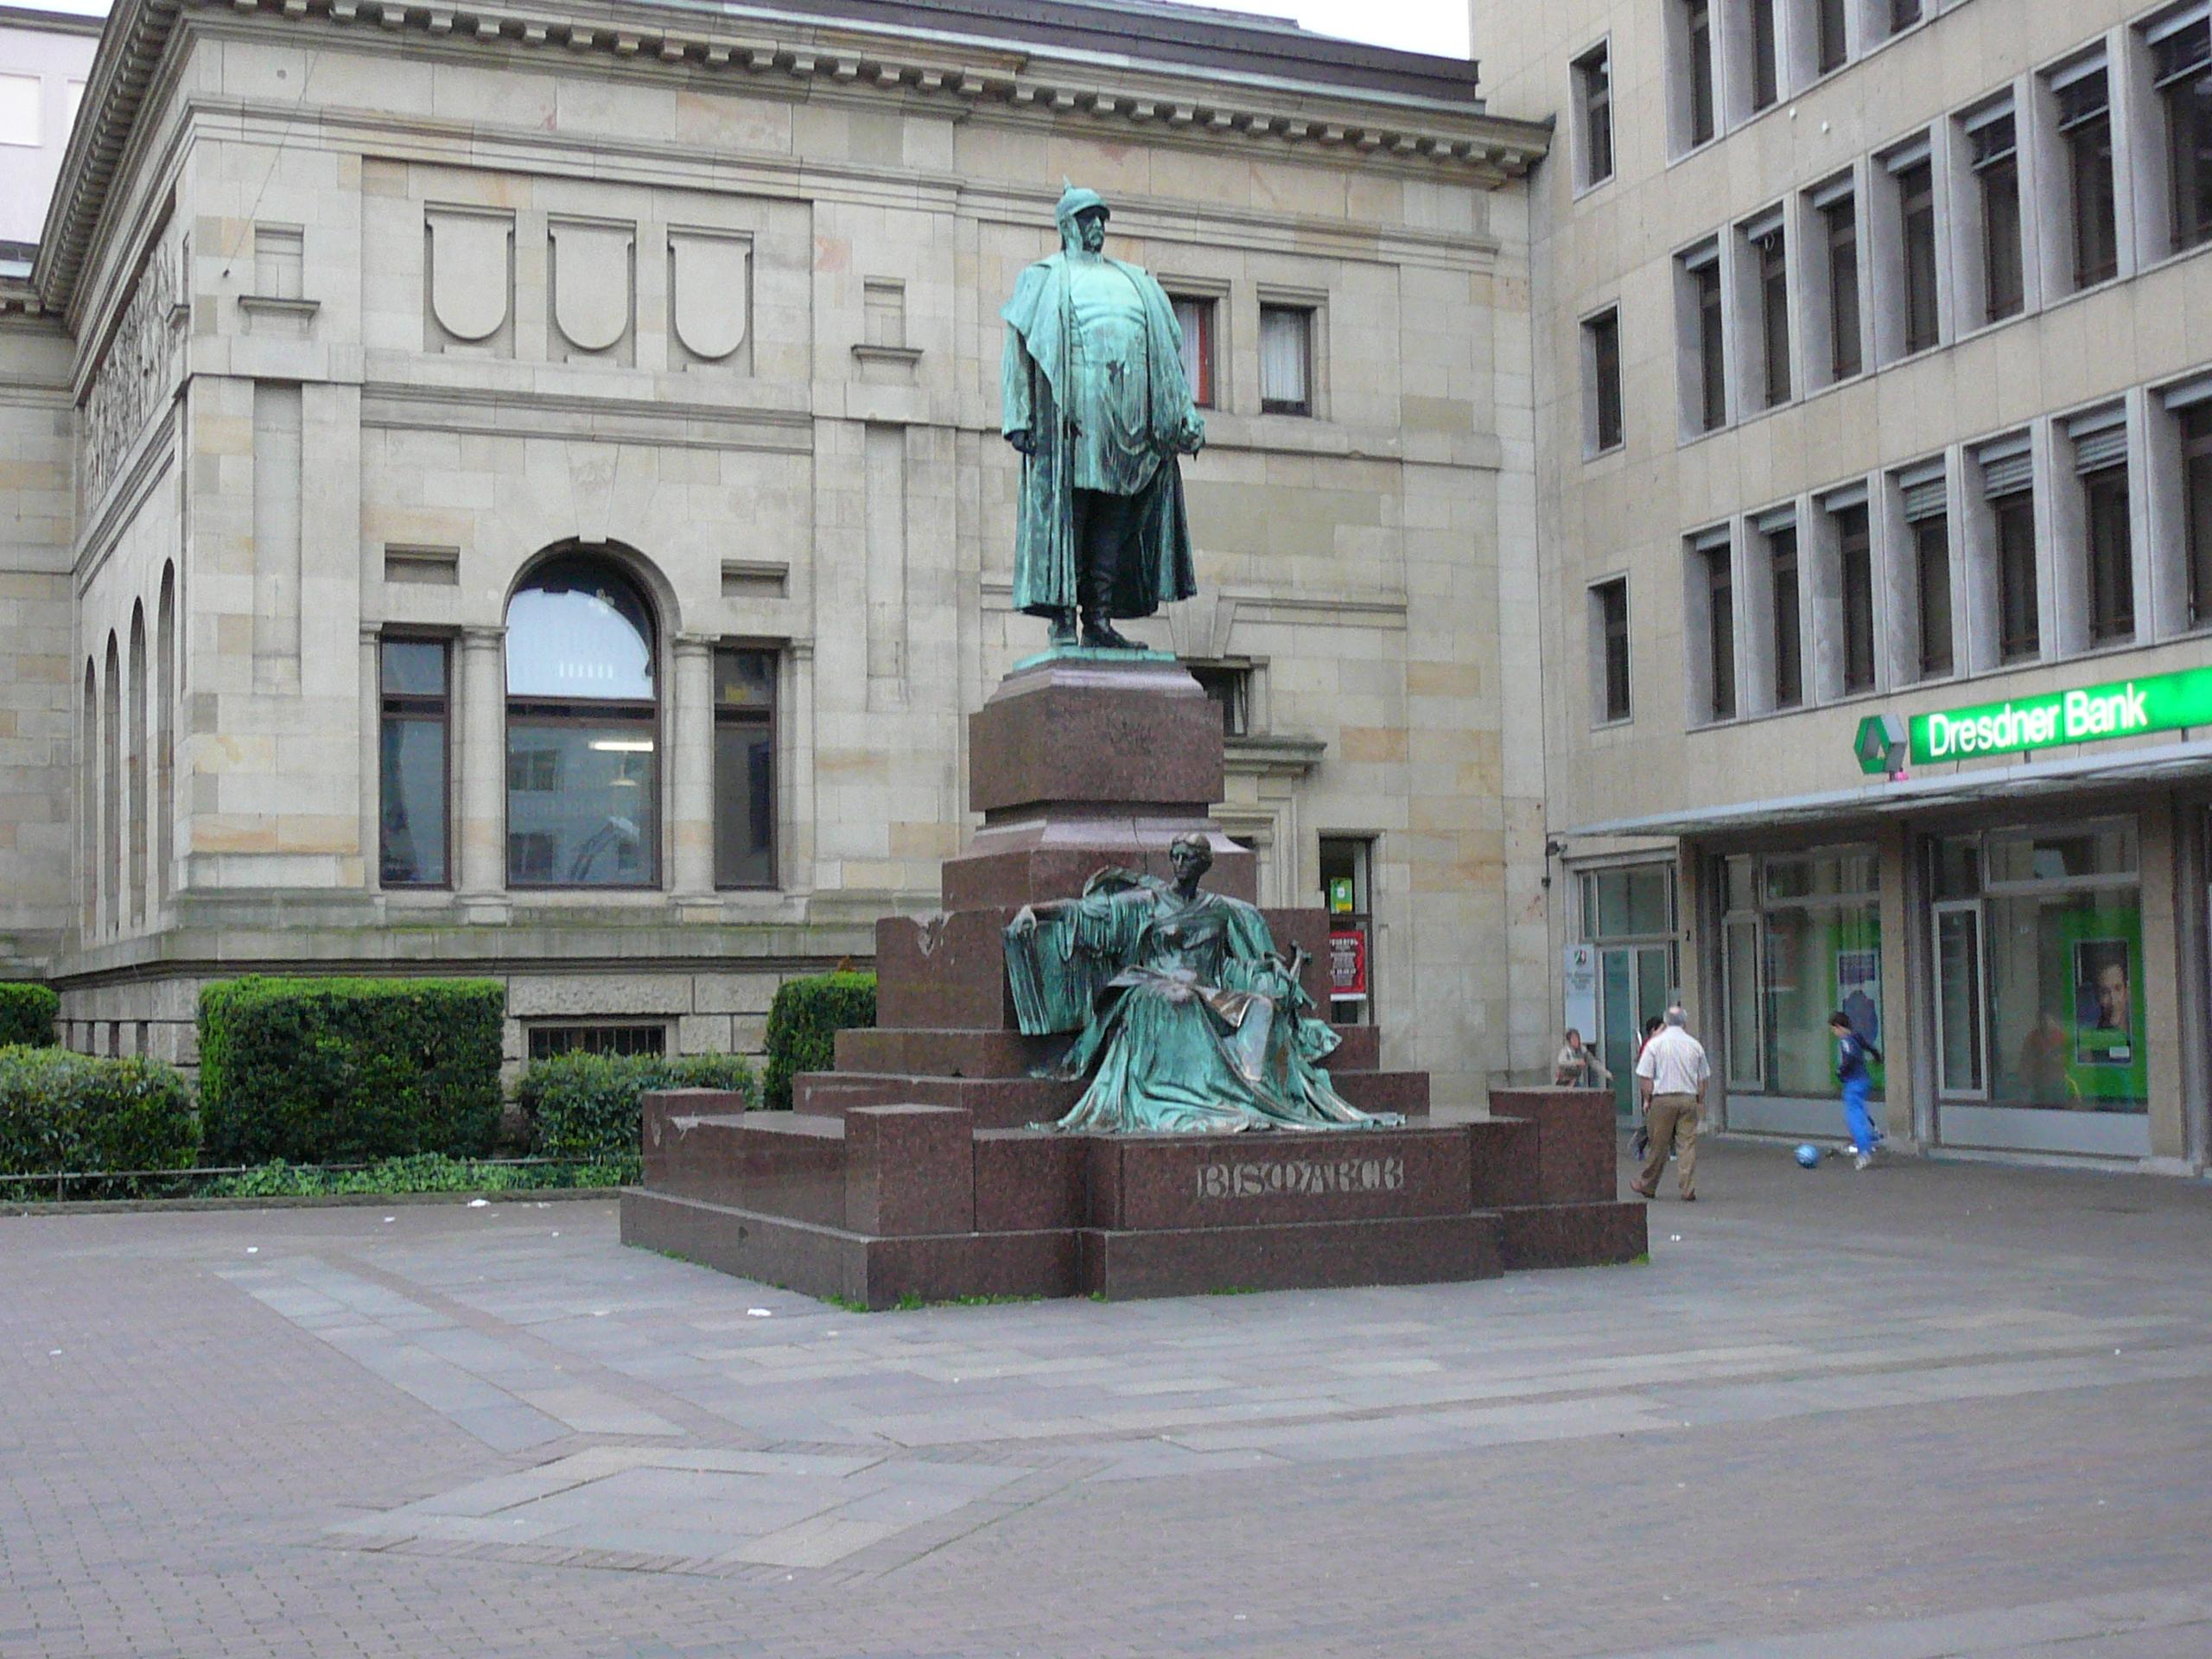 Bismarck Denkmal Berlin Bismarck-denkmal Barmen